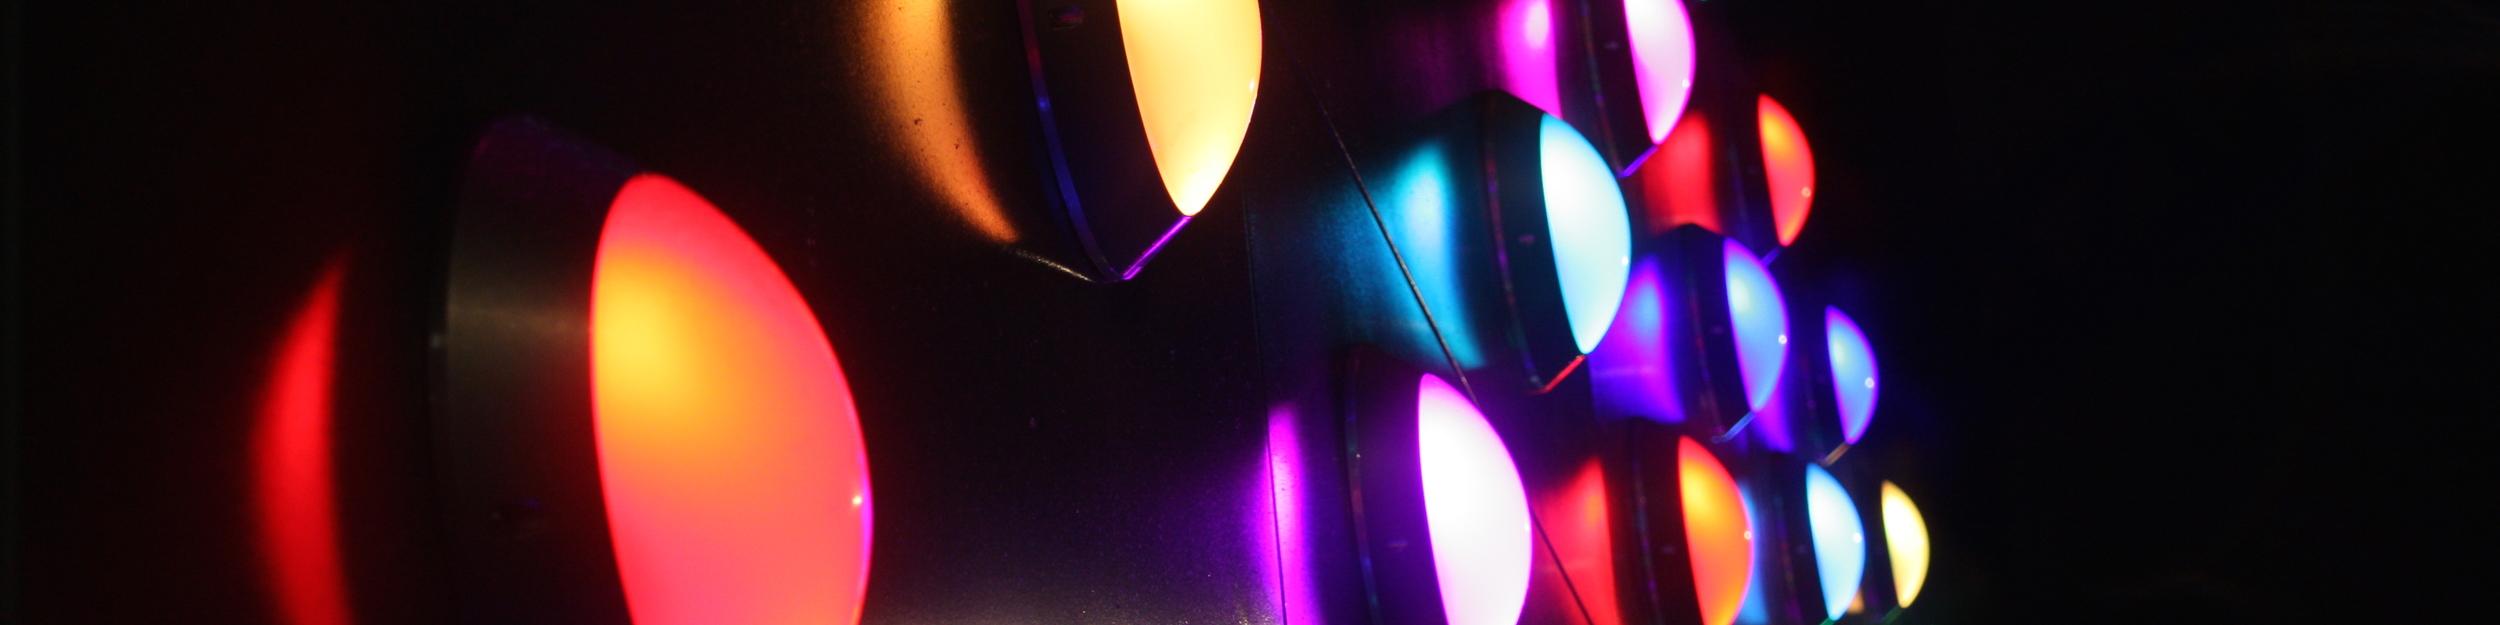 Glowing orbs feature.jpeg